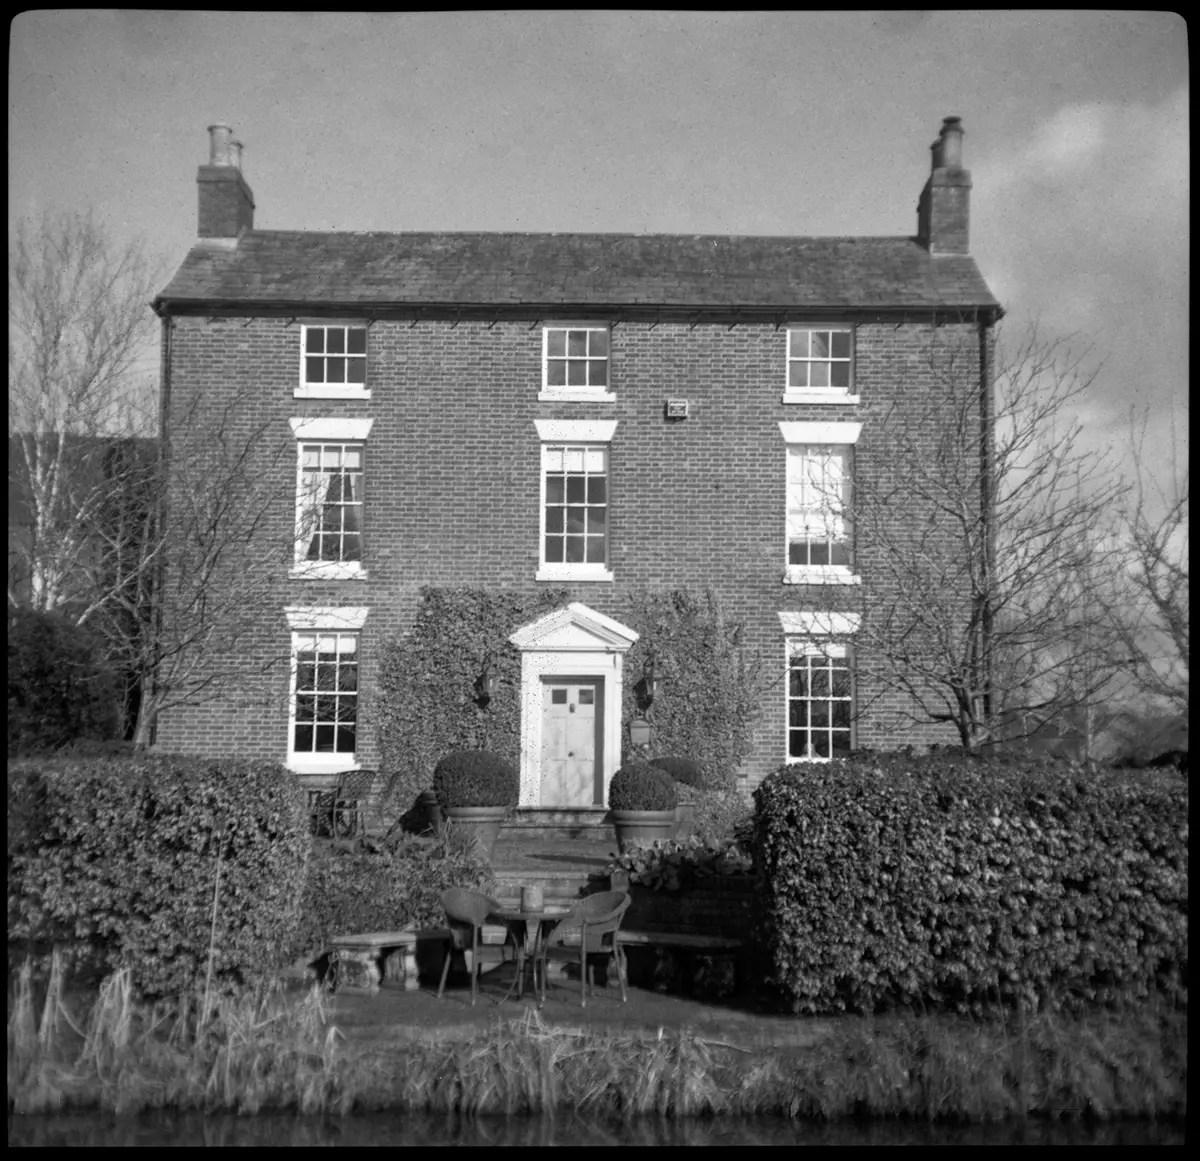 Staffordshire Farmhouse - Fomapan 200 Creative, The Durst Sei Sei / Durst 66